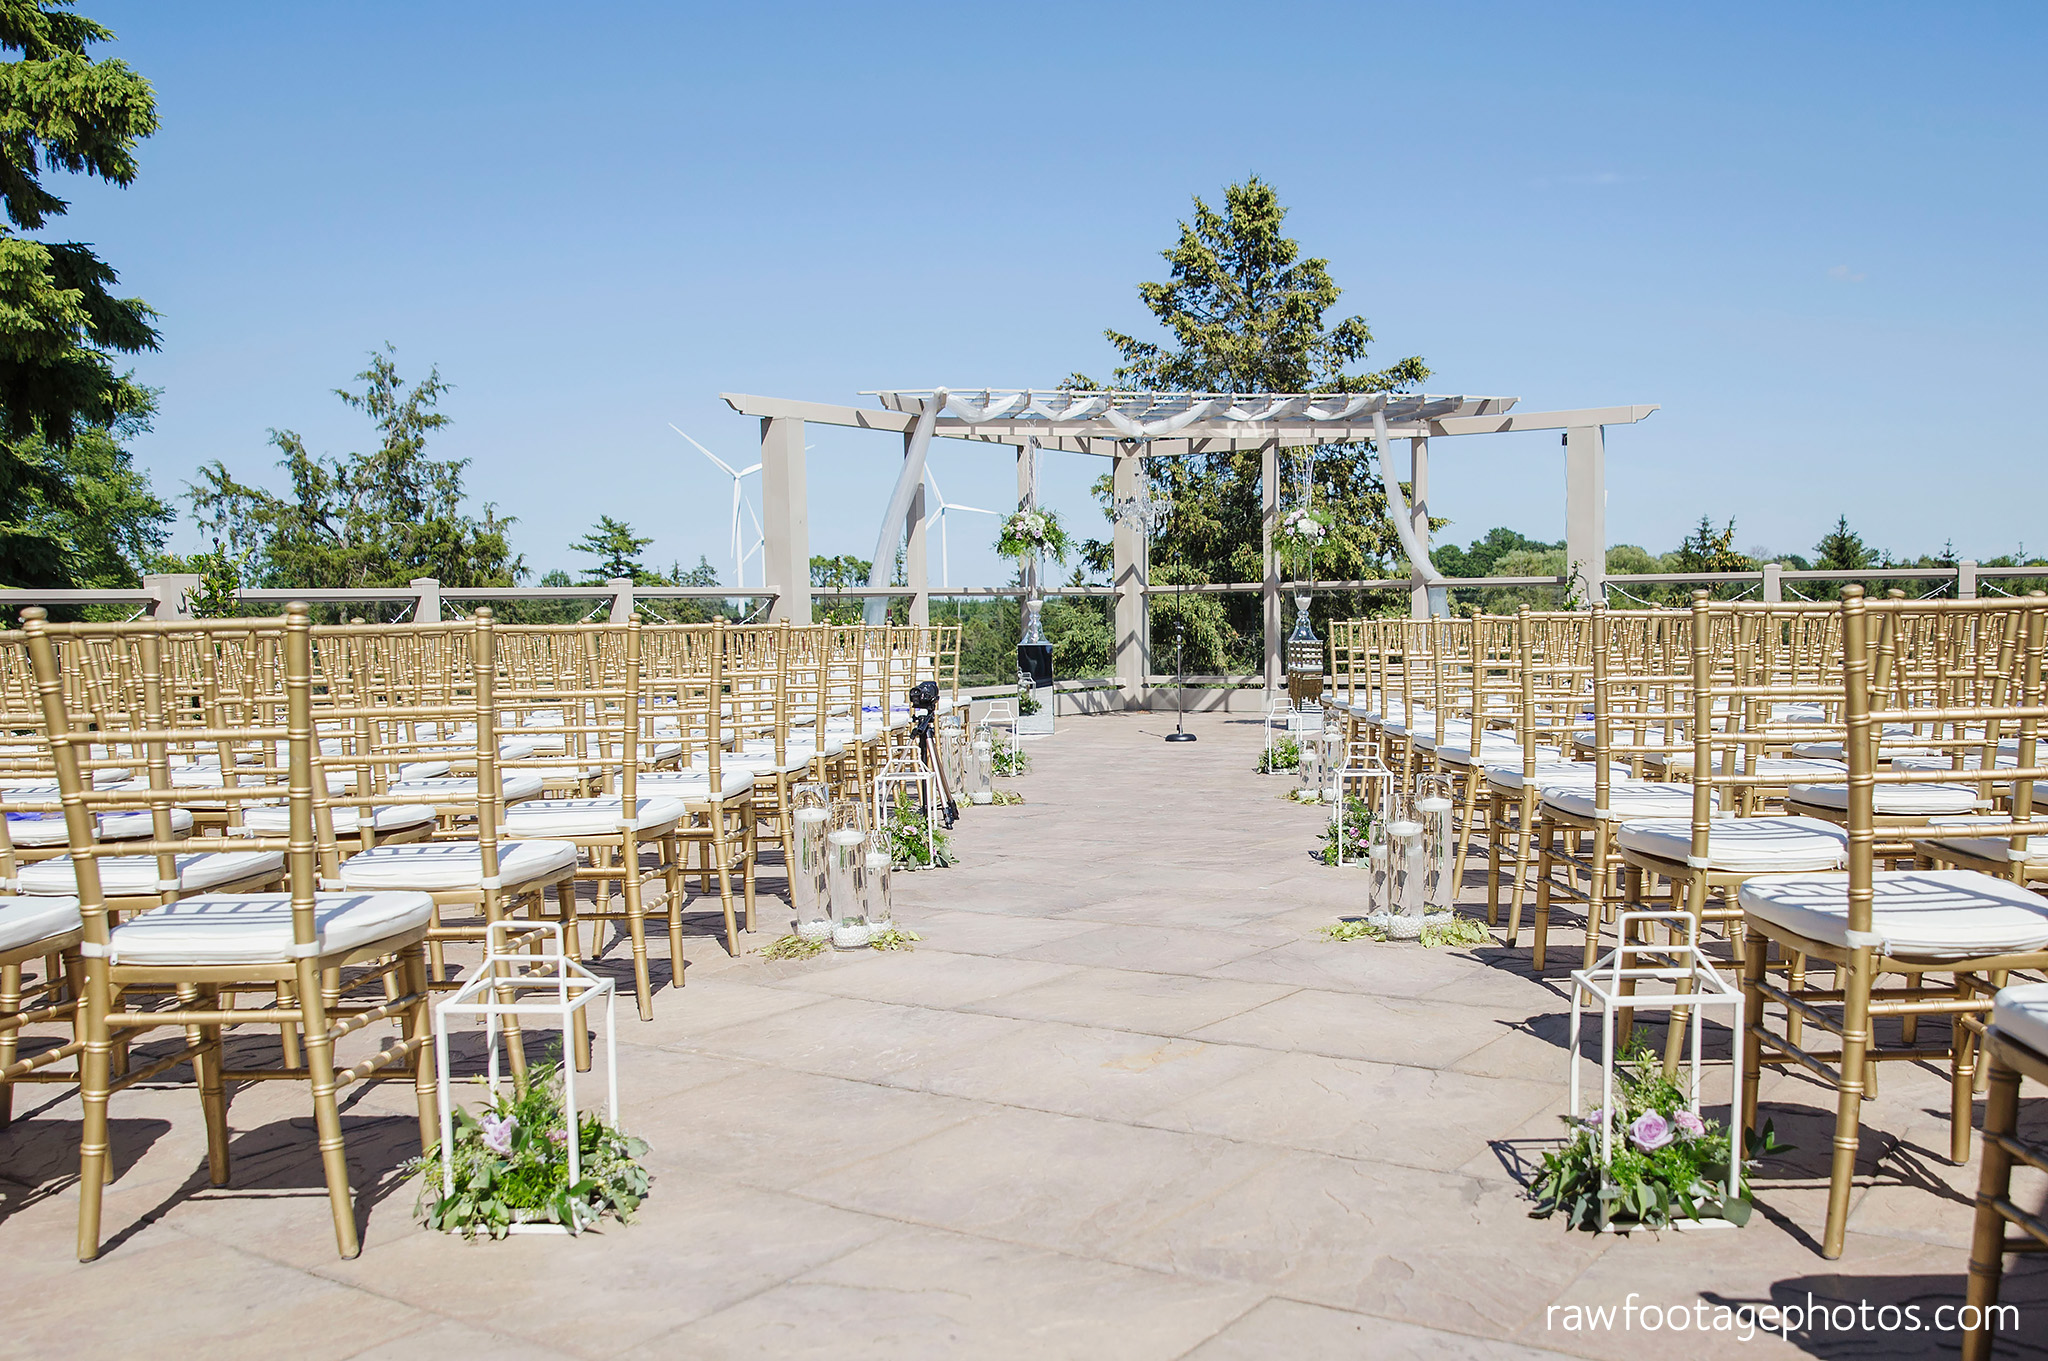 london_ontario_wedding_photographer-grand_bend_wedding_photographer-oakwood_resort_wedding-beach_wedding-sunset_wedding-raw_footage_photography031.jpg